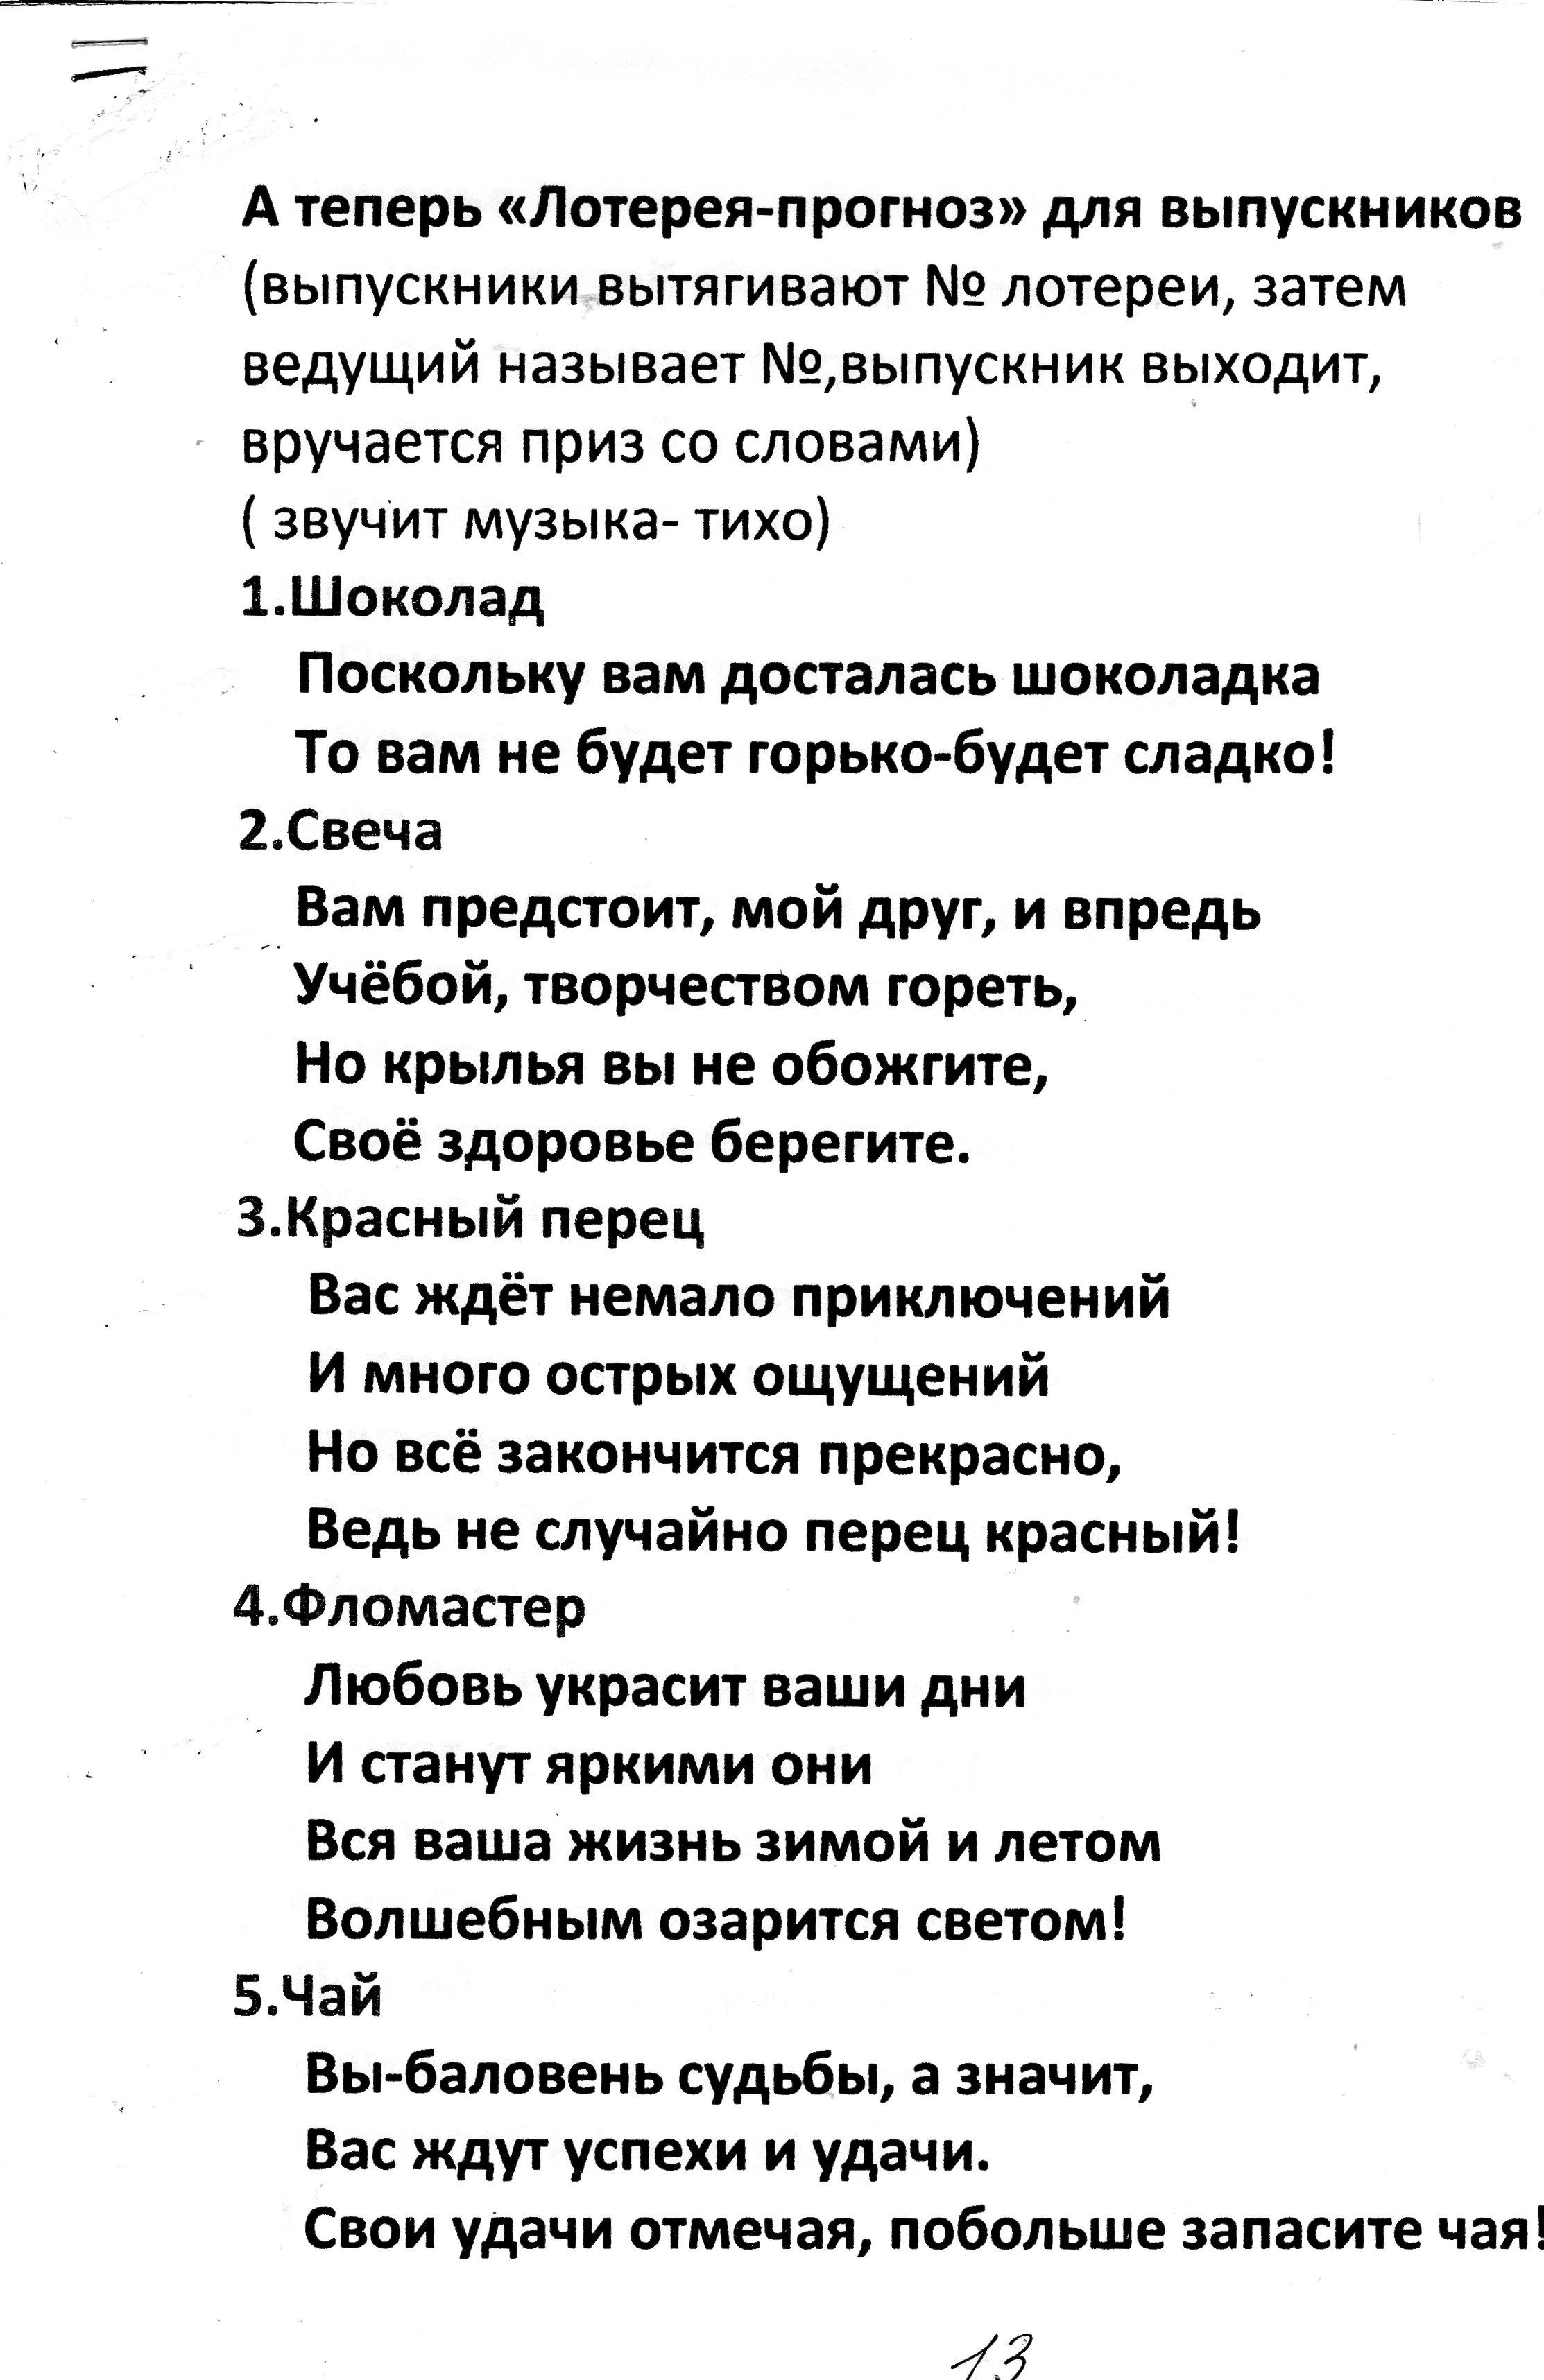 C:\Documents and Settings\ADMIN\Мои документы\9 кл выпускной\img019.jpg